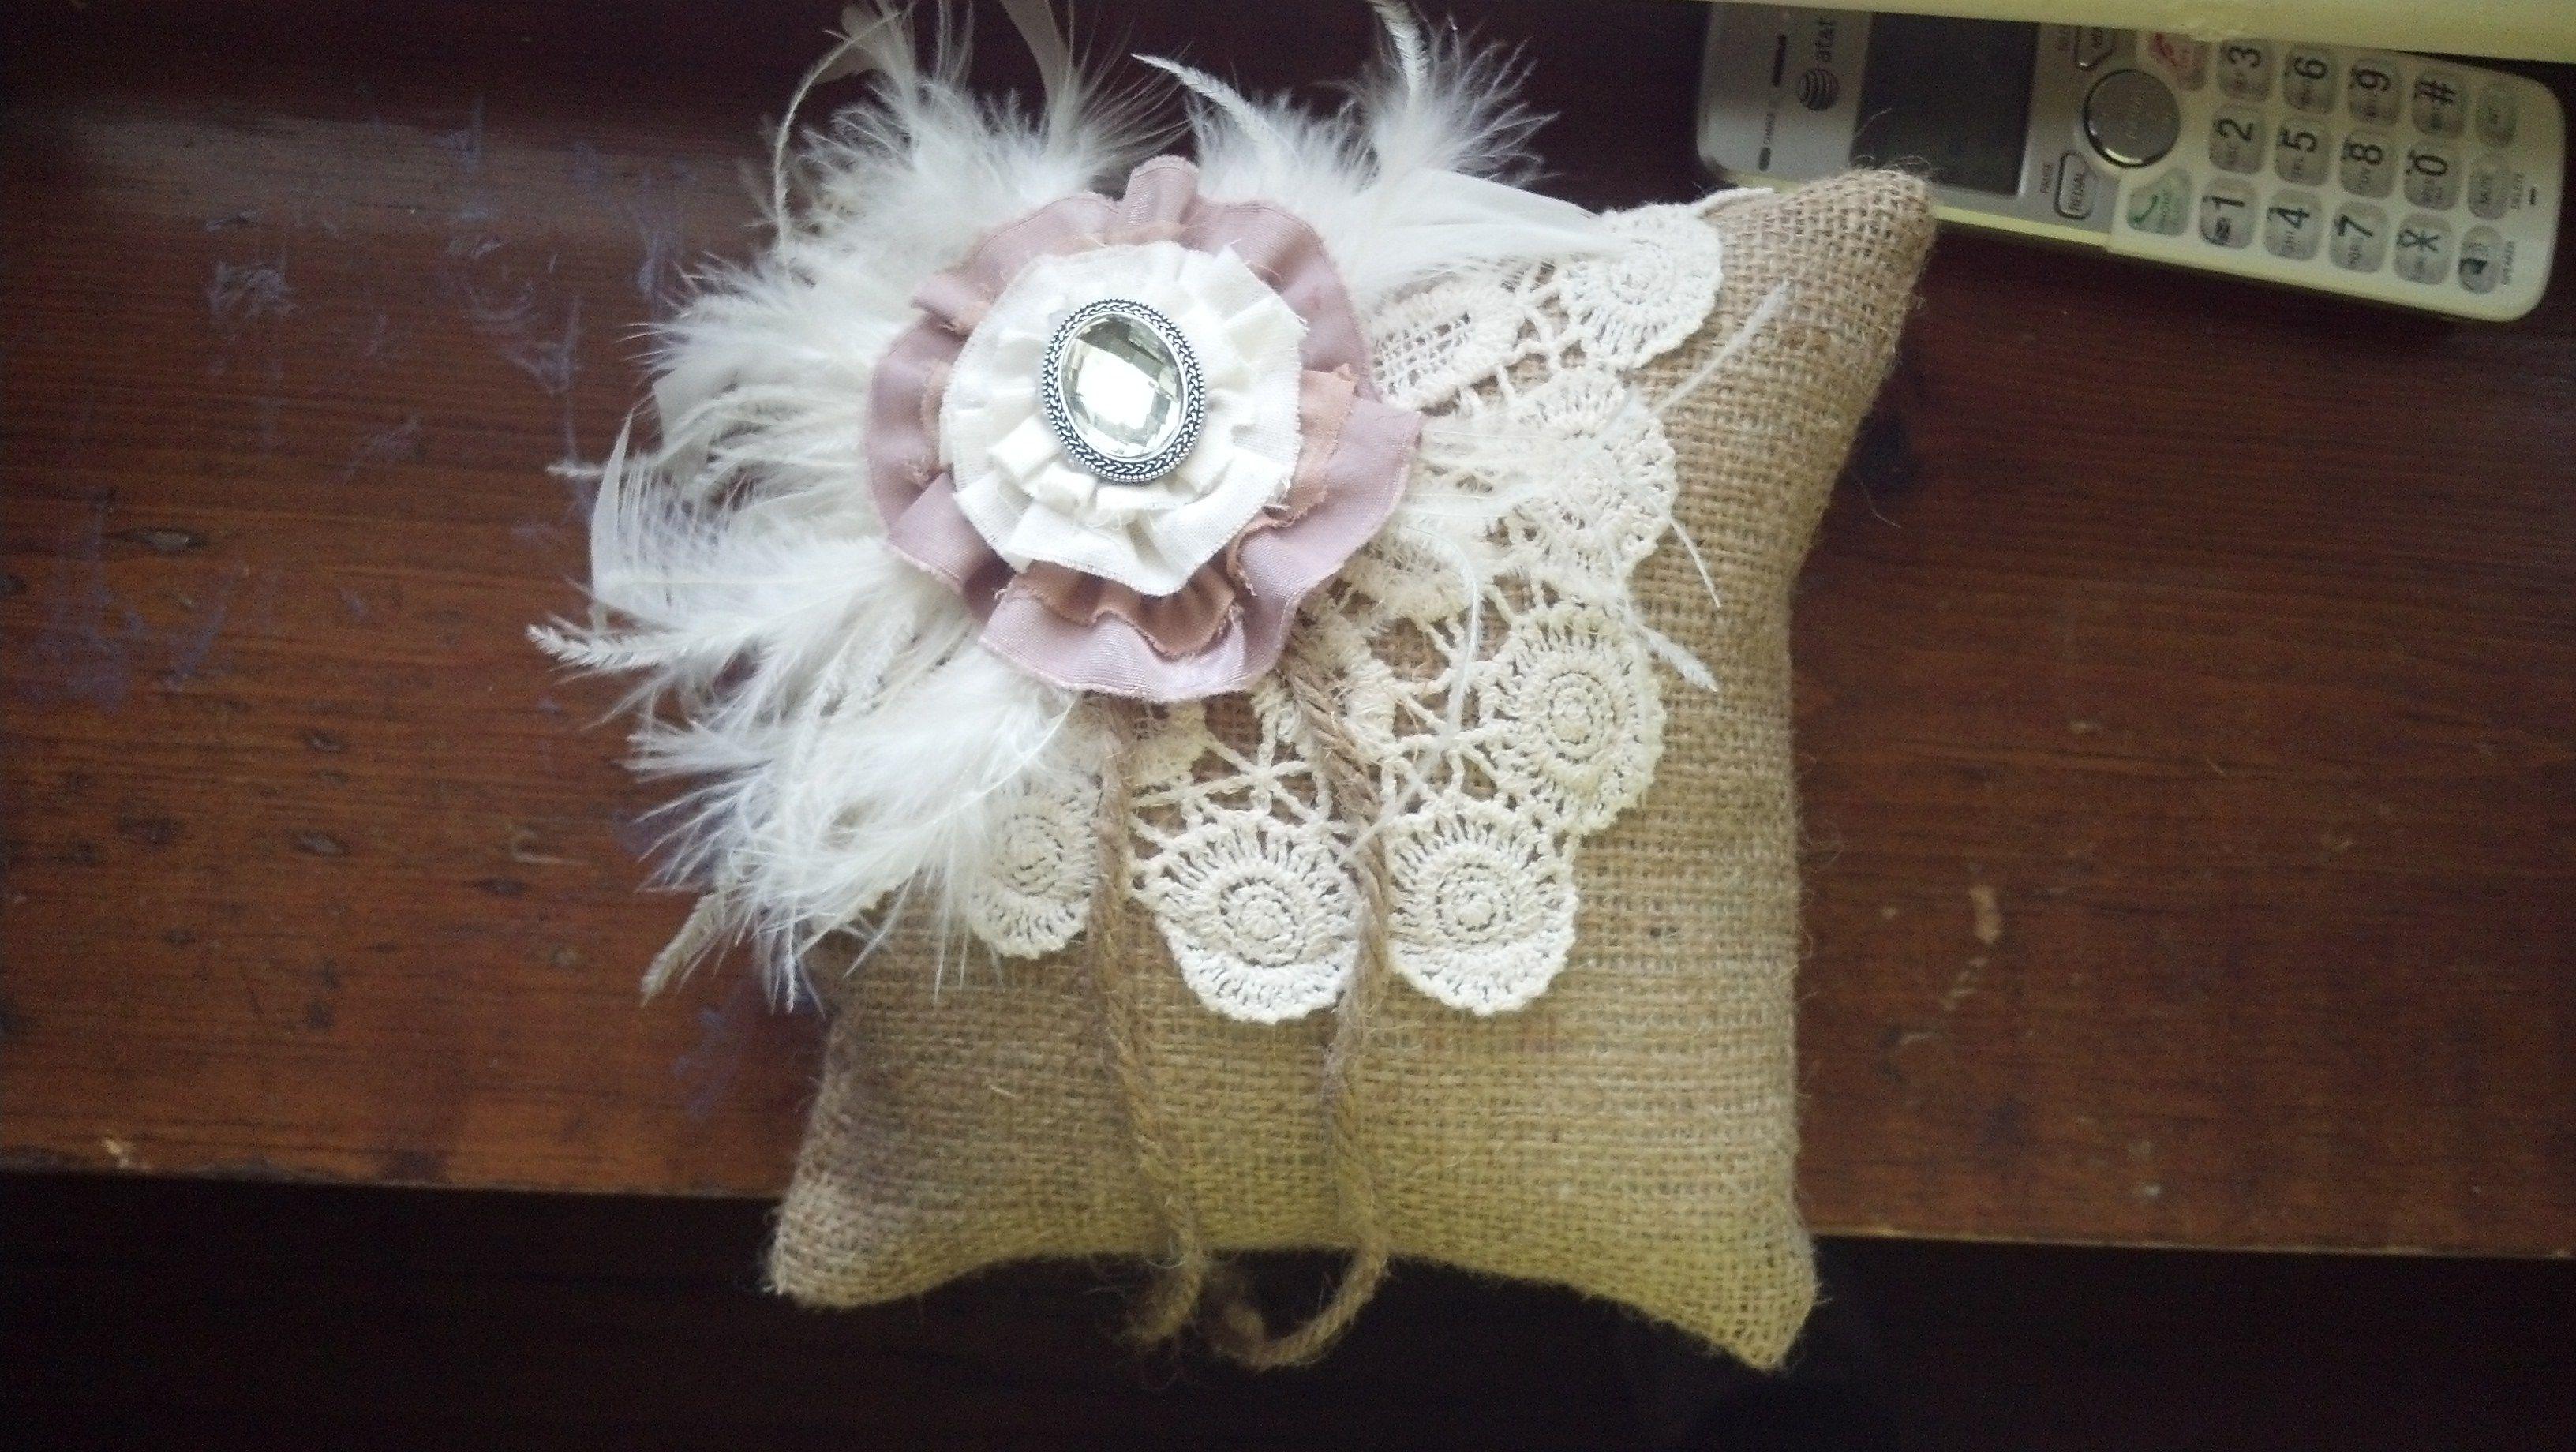 My daughterus diy wedding burlap a piece of a crochet vest from